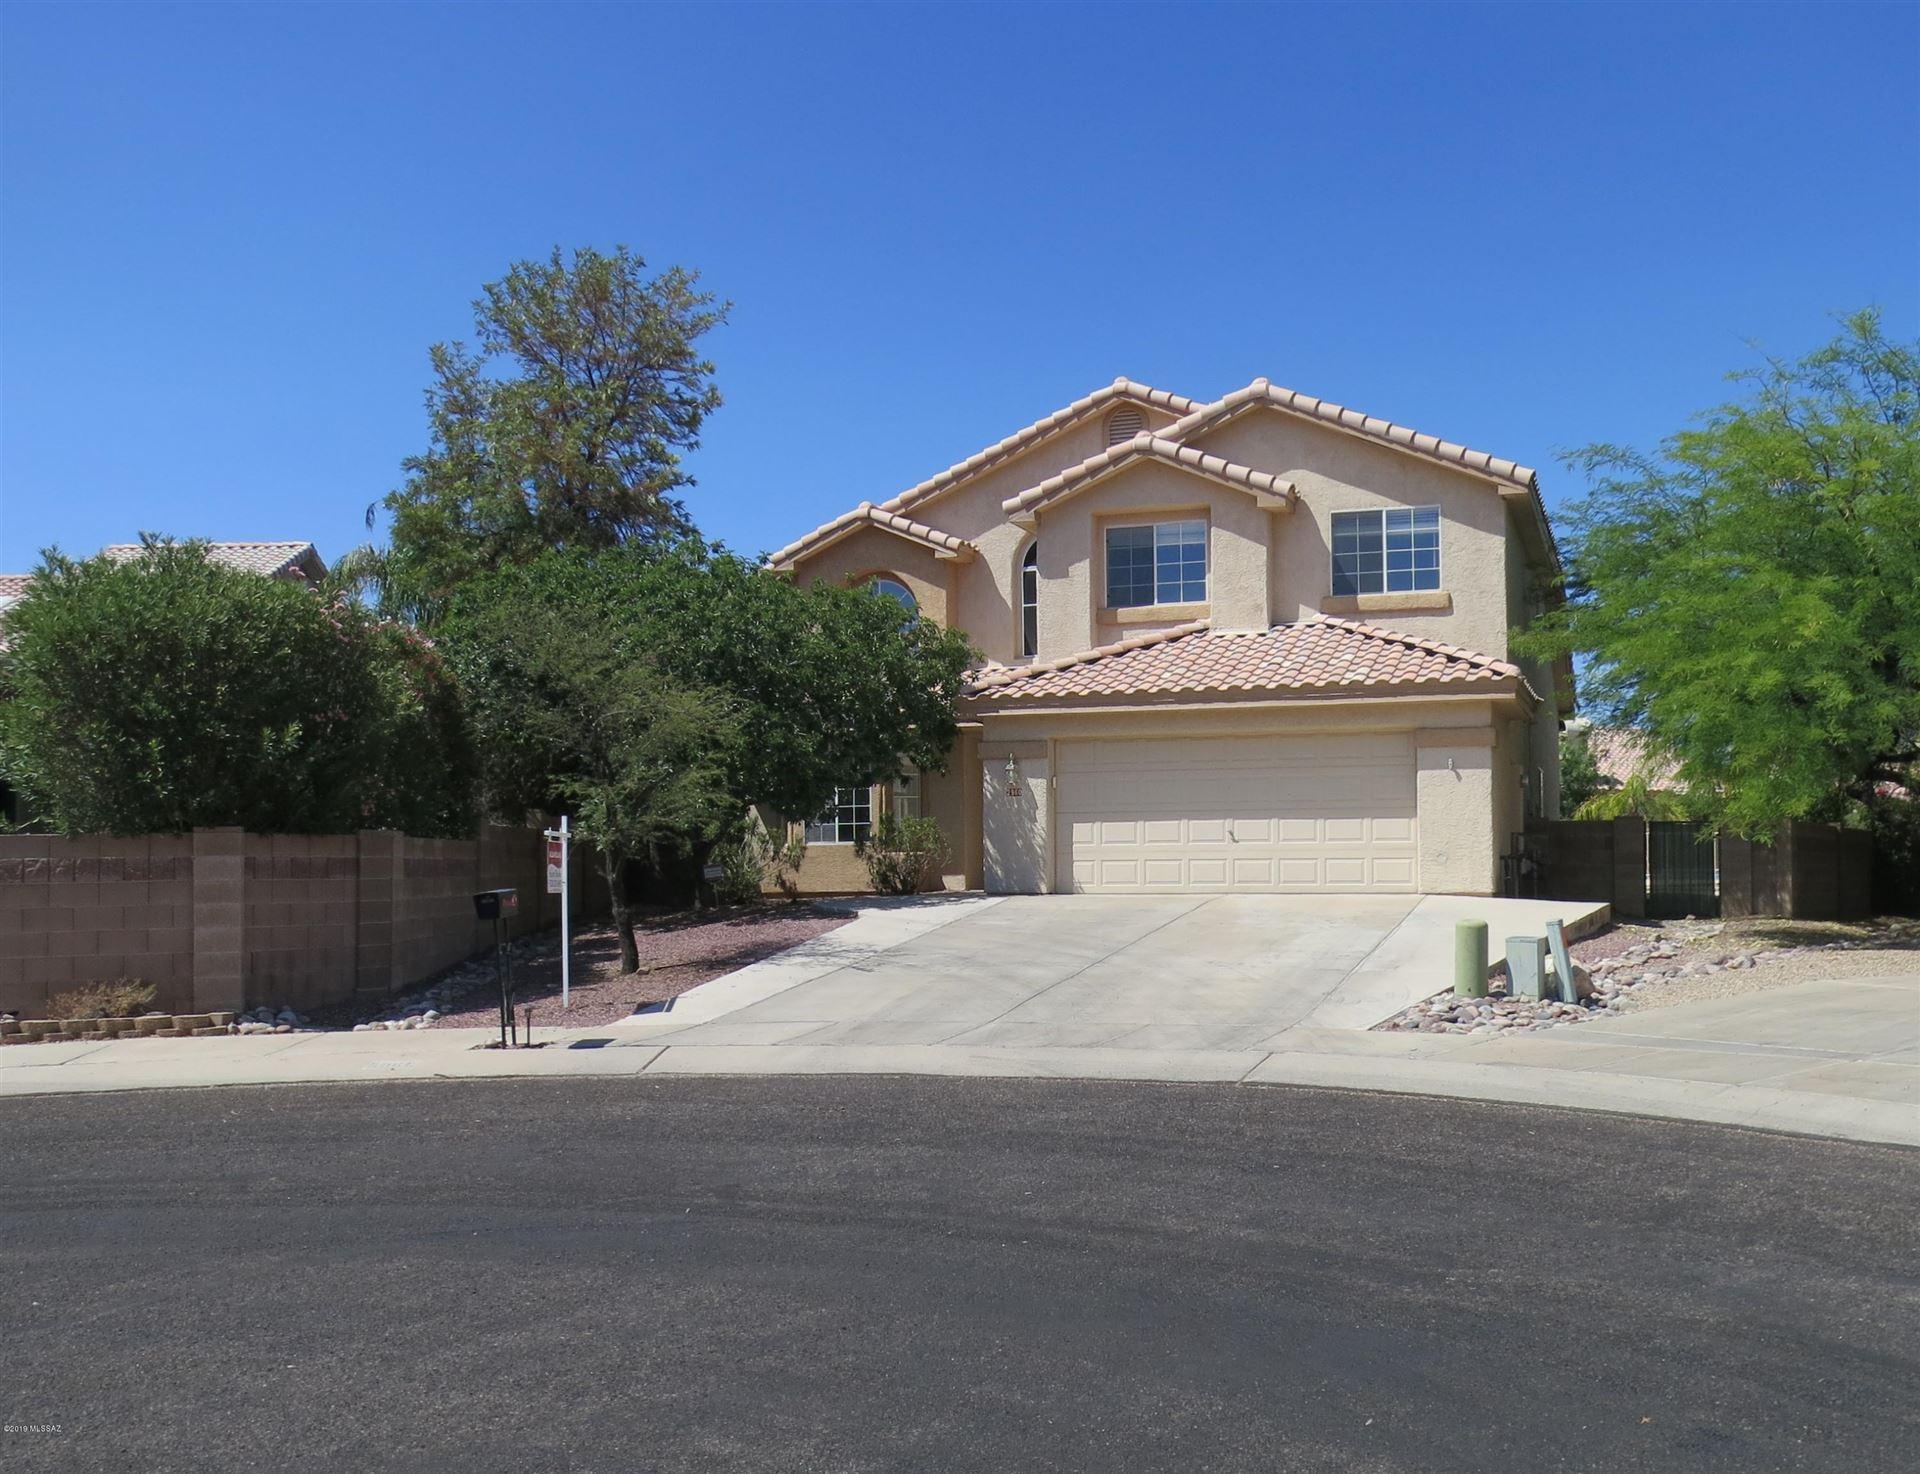 2960 W Corte Madelena, Tucson, AZ 85741 - MLS#: 22005536